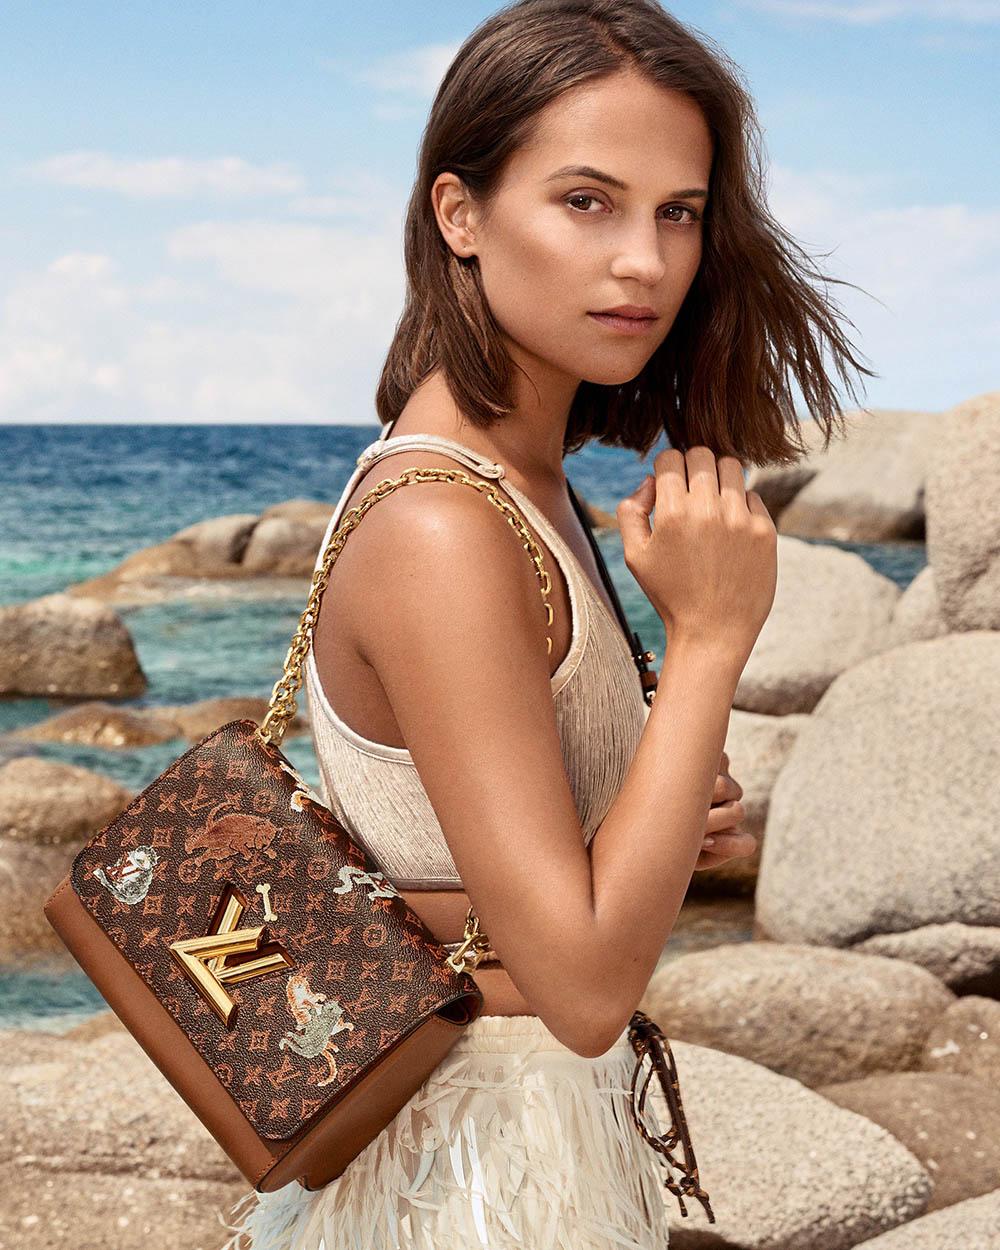 Louis Vuitton Cruise 2019 Campaign with Alicia Vikander